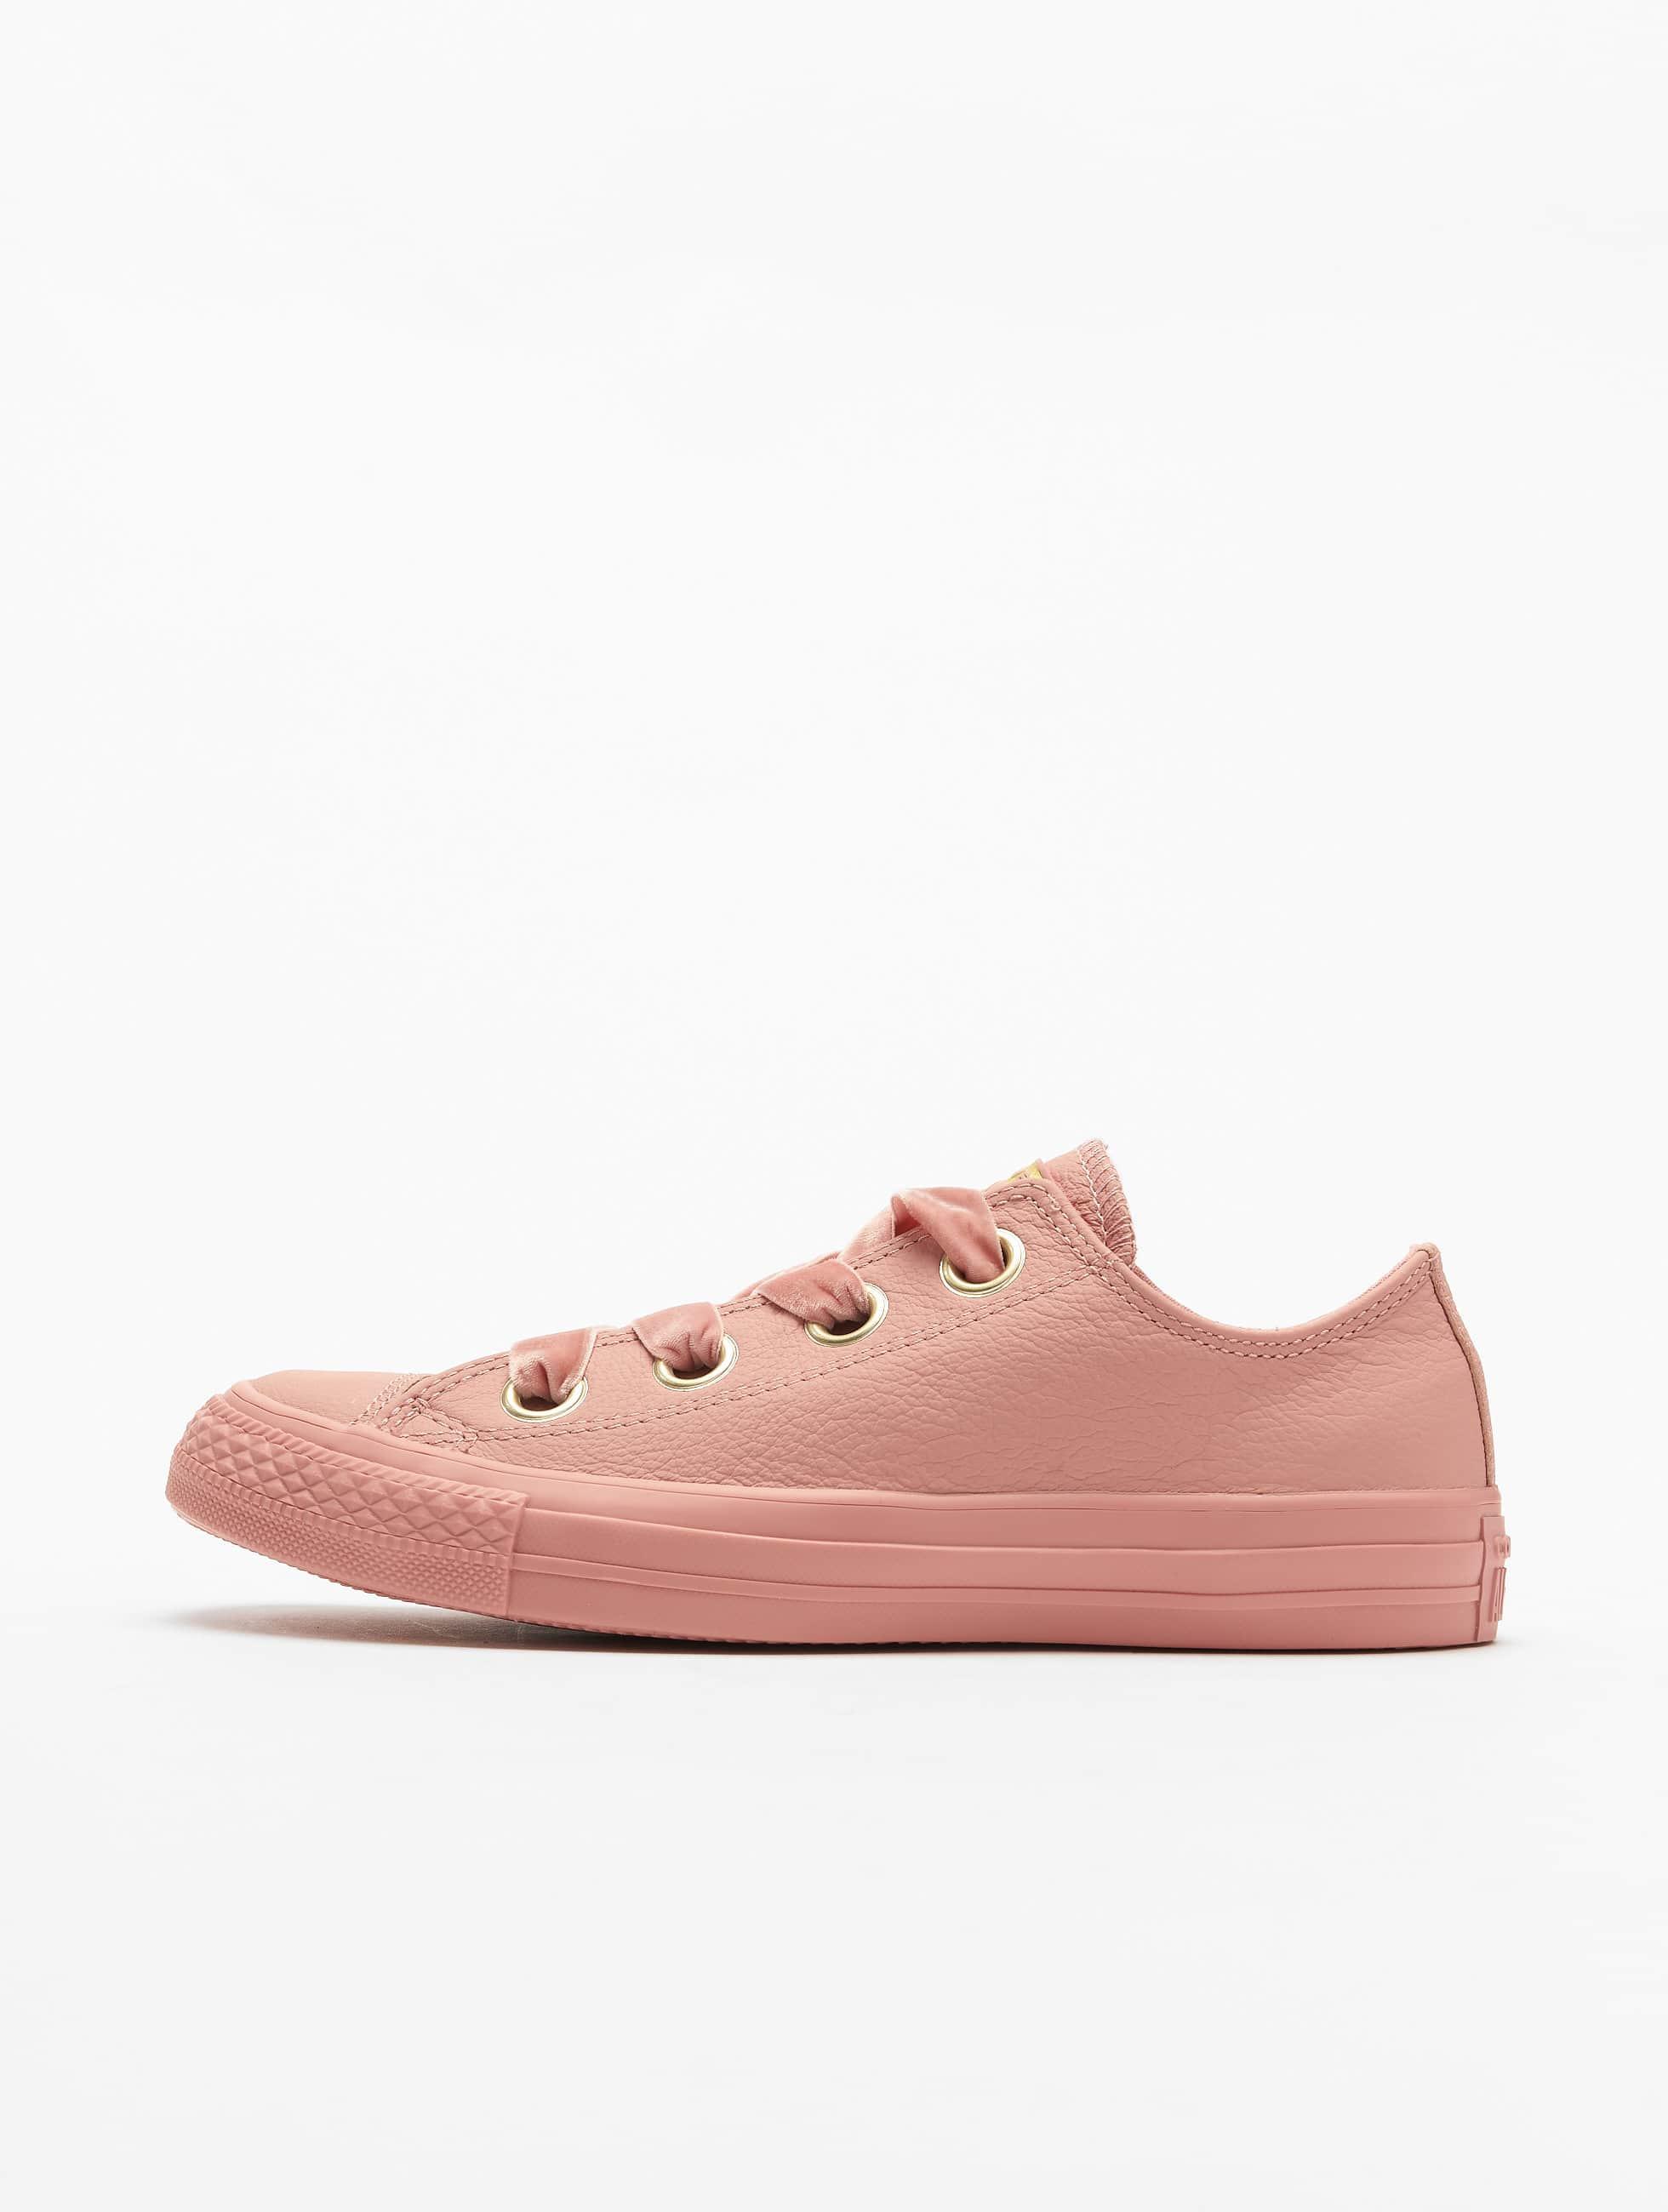 converse sneaker pink